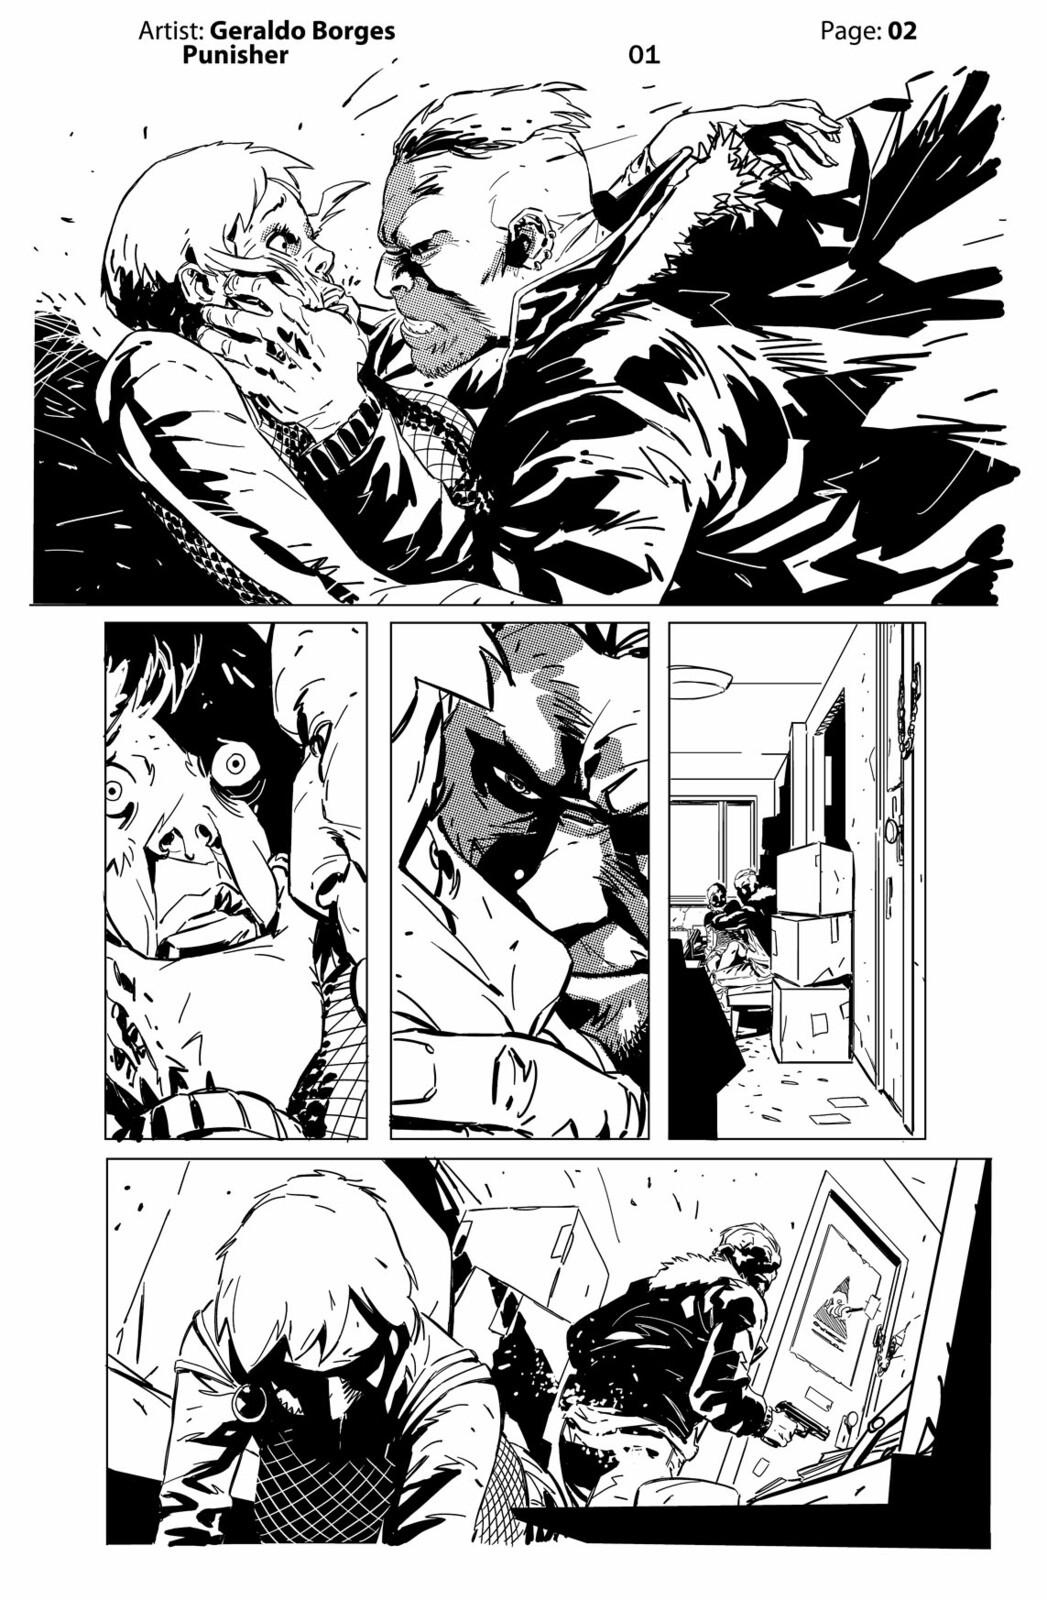 Geraldo Borges - Punisher Page 02